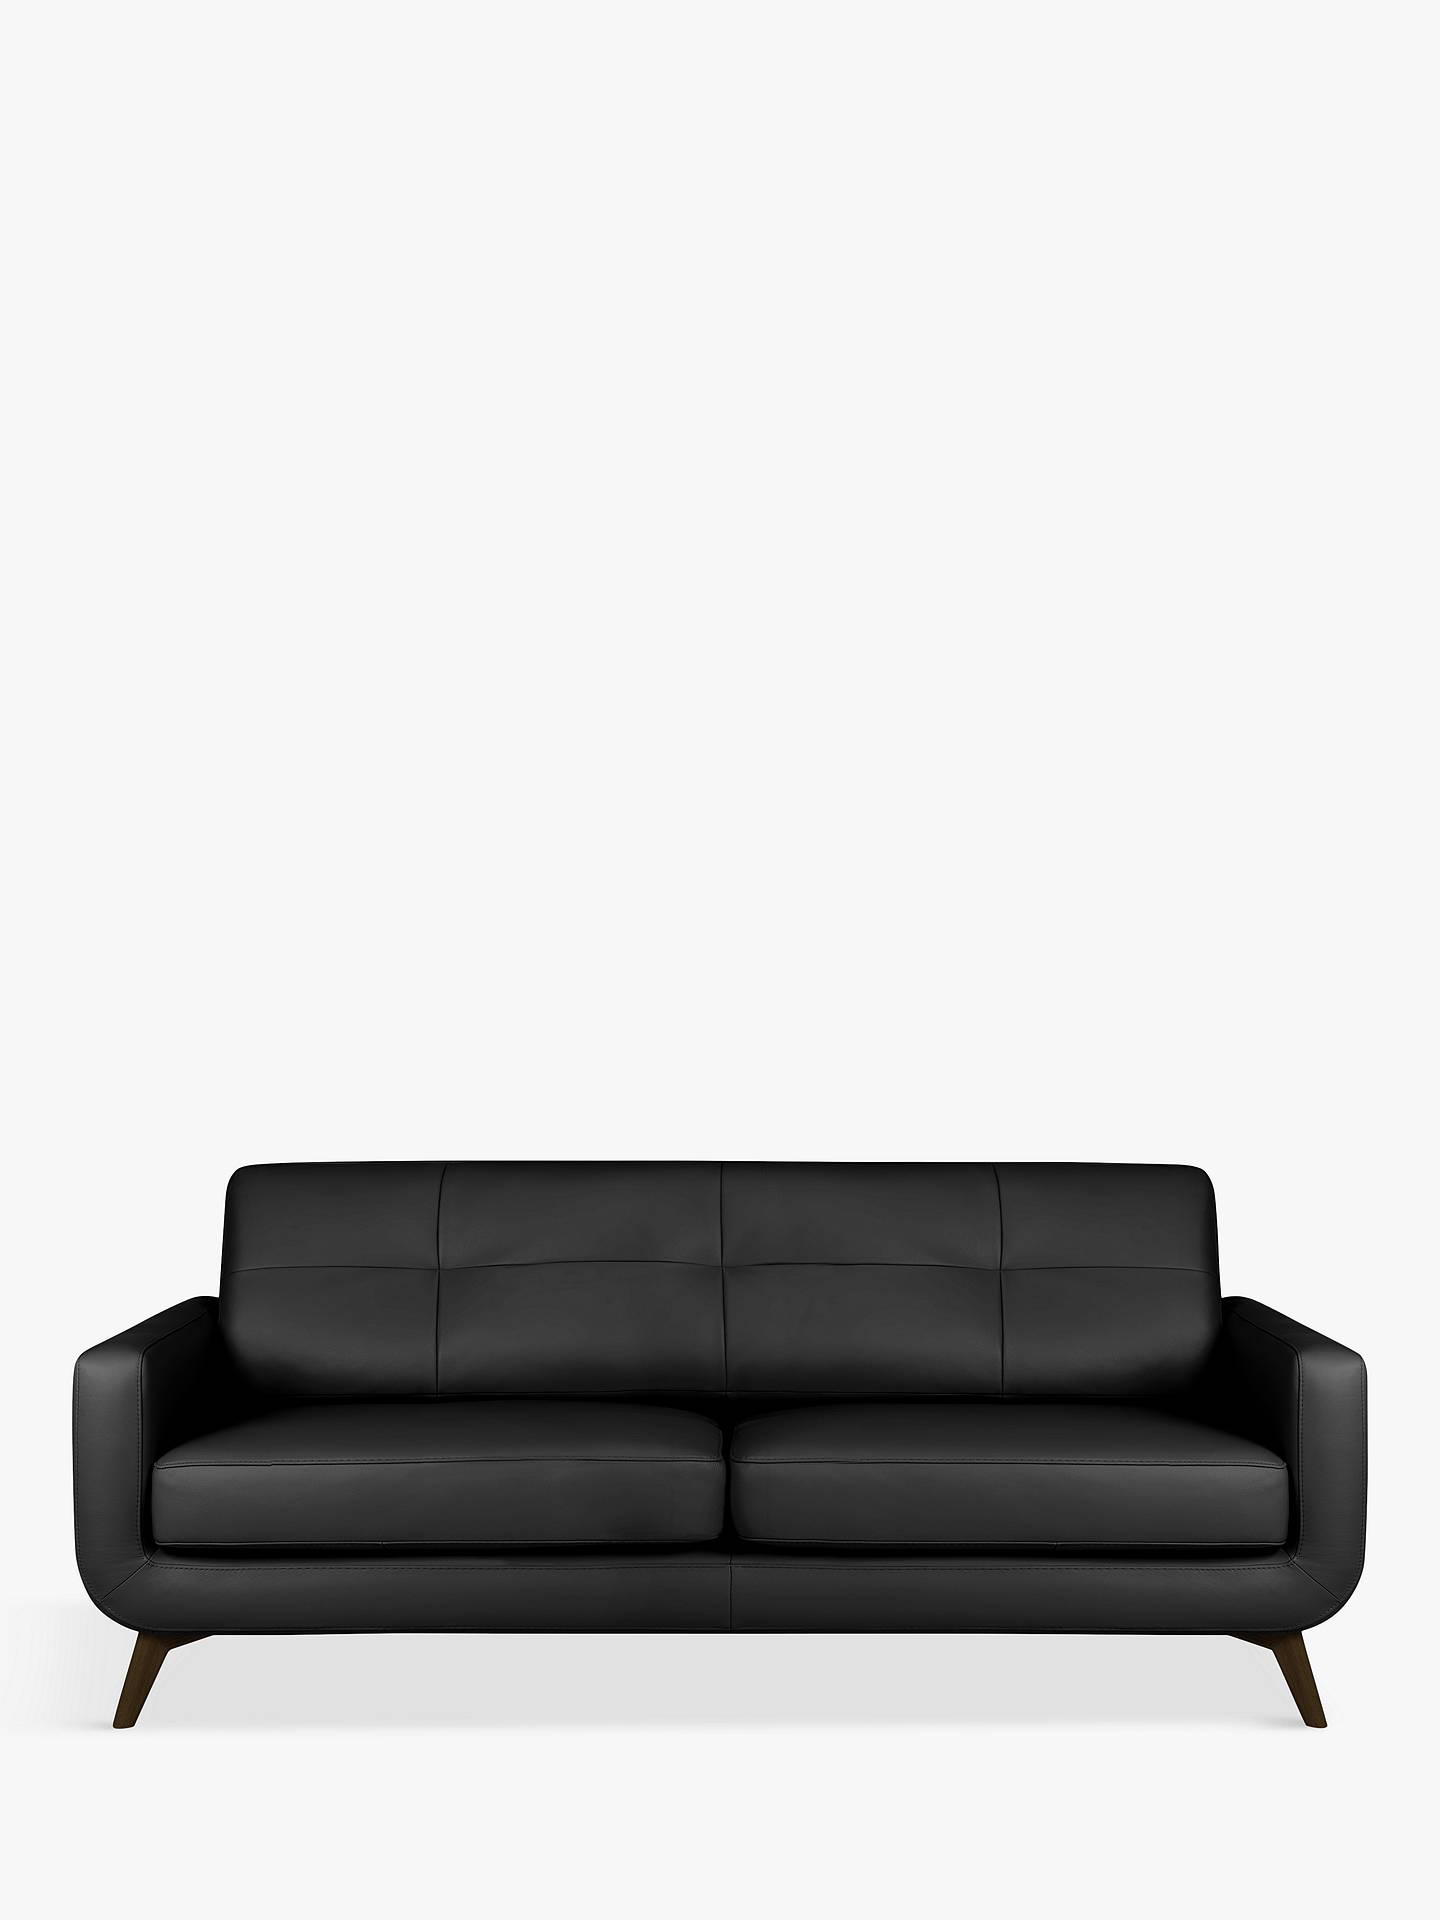 John Lewis & Partners Barbican Leather Large 3 Seater Sofa, Dark Leg,  Contempo Black